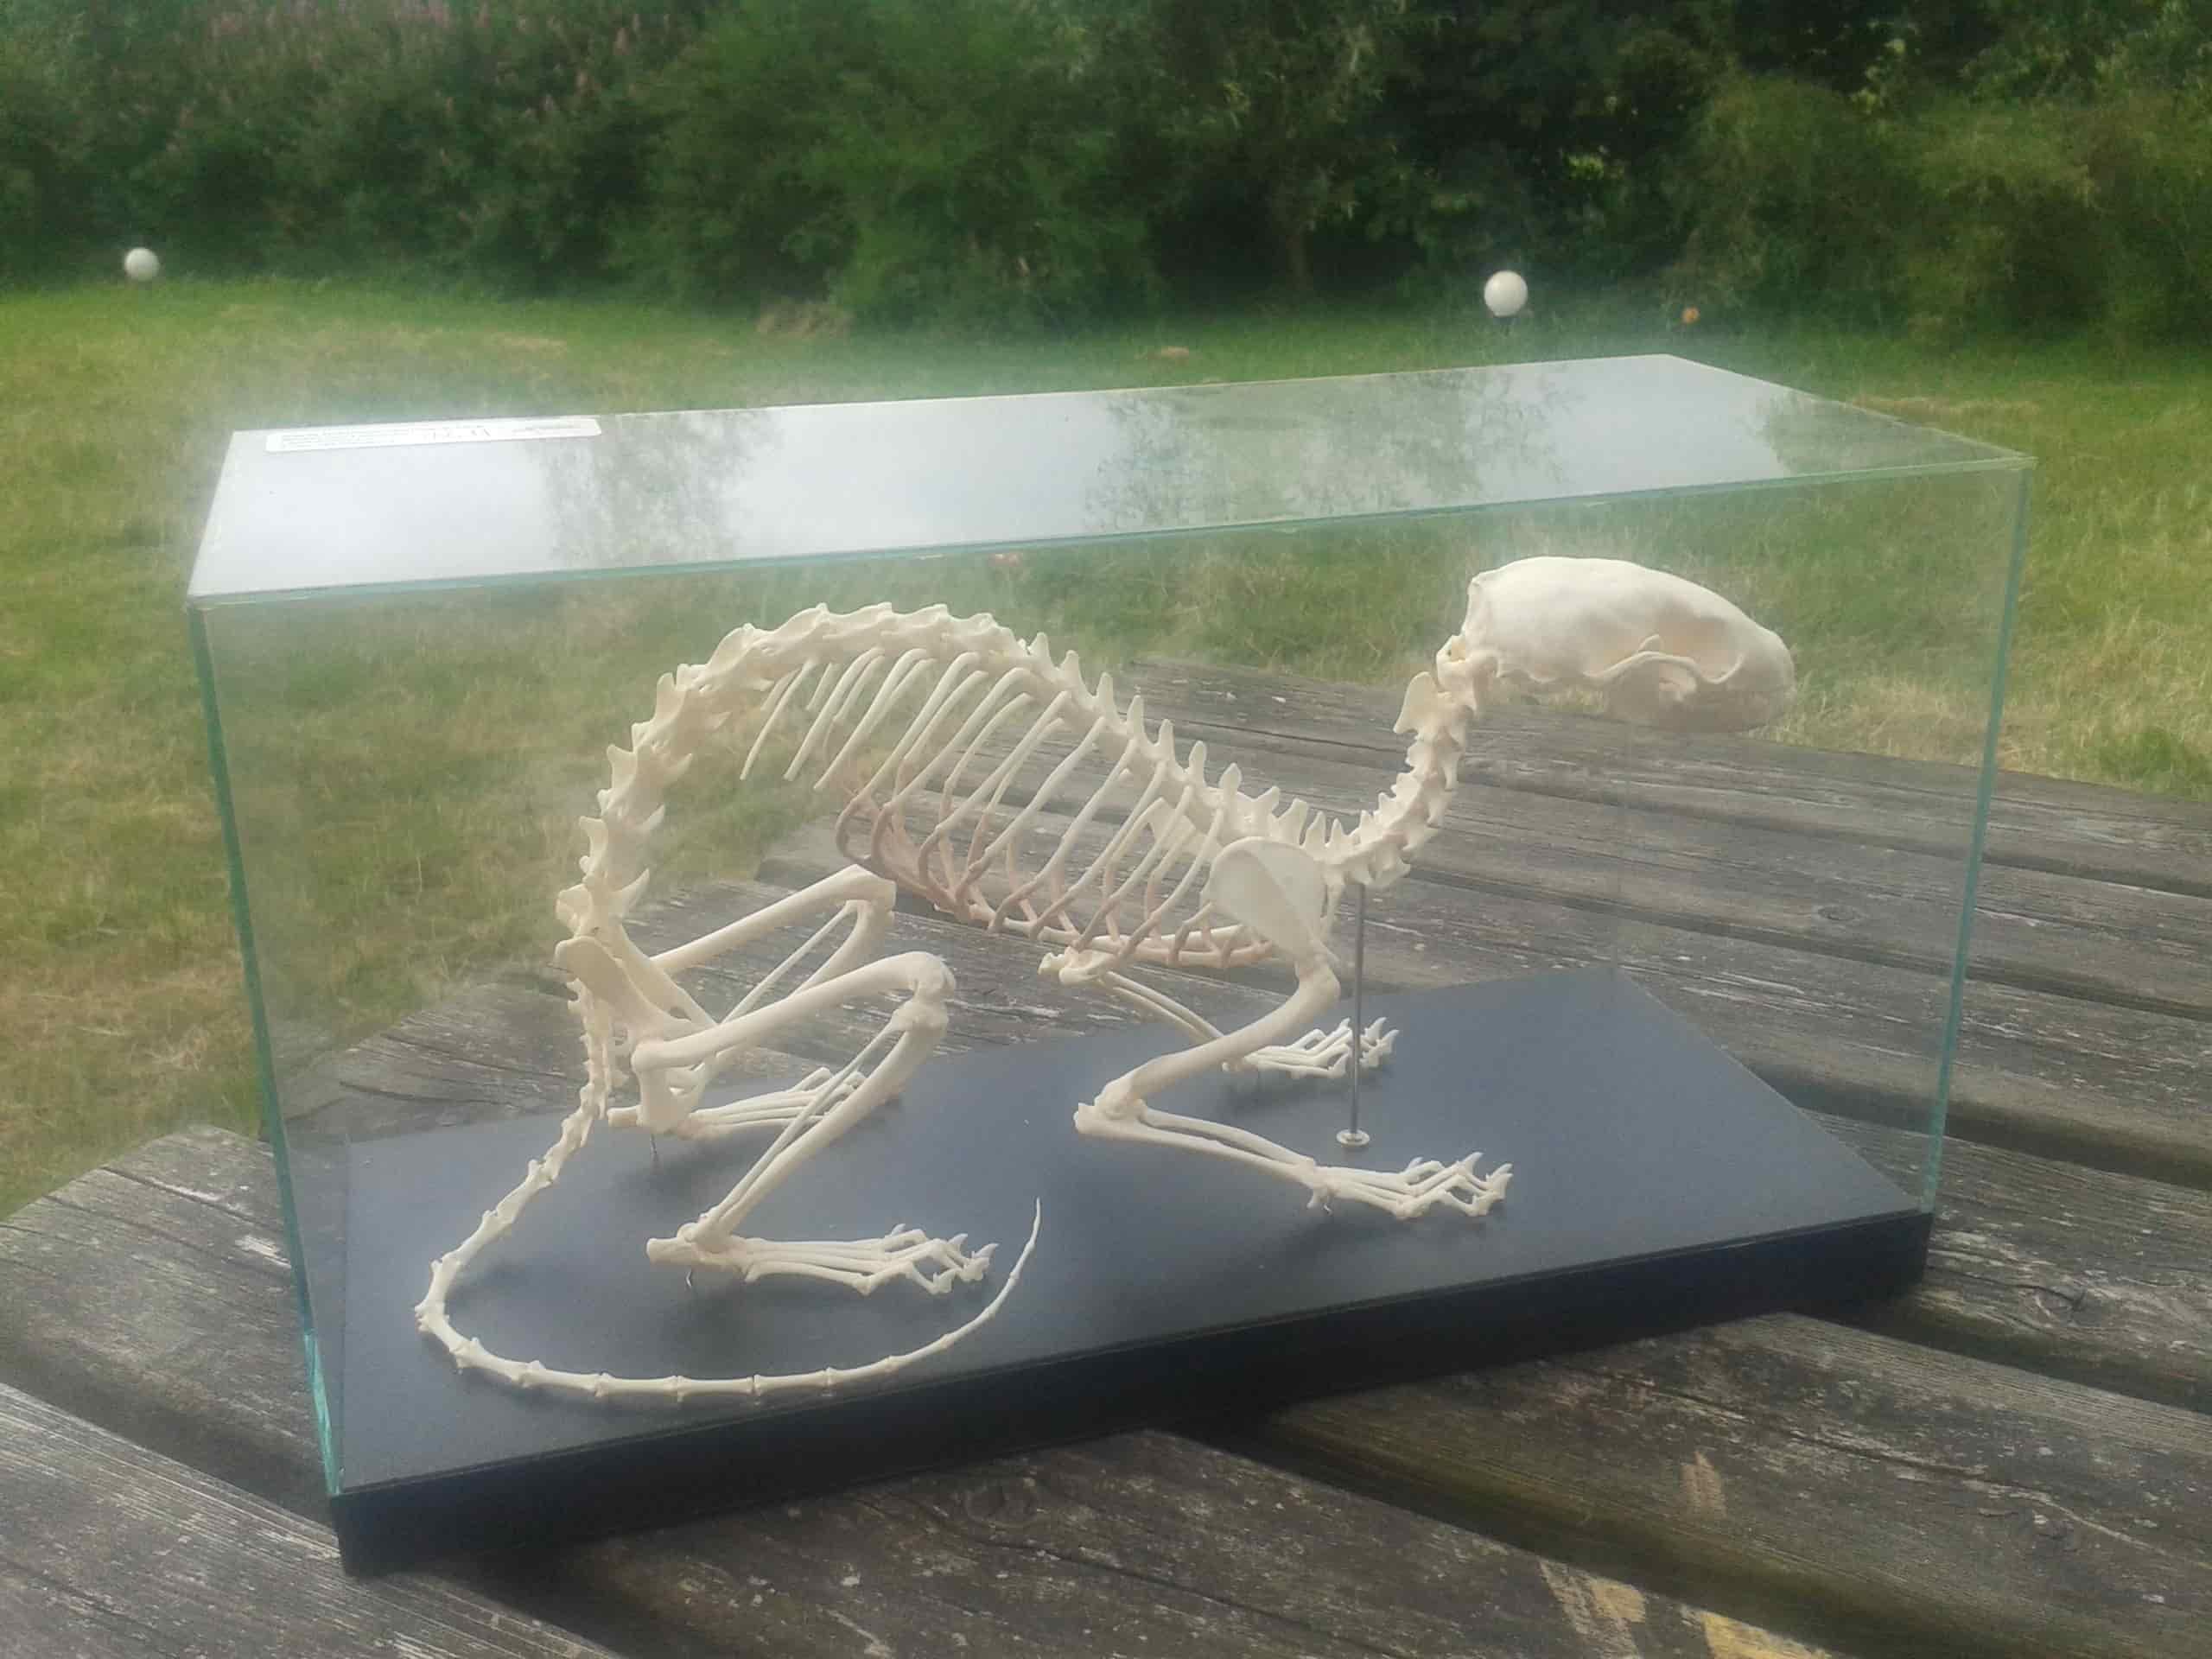 Skeletons | young stone marten | Limburghuis GaiaZOO Kerkrade